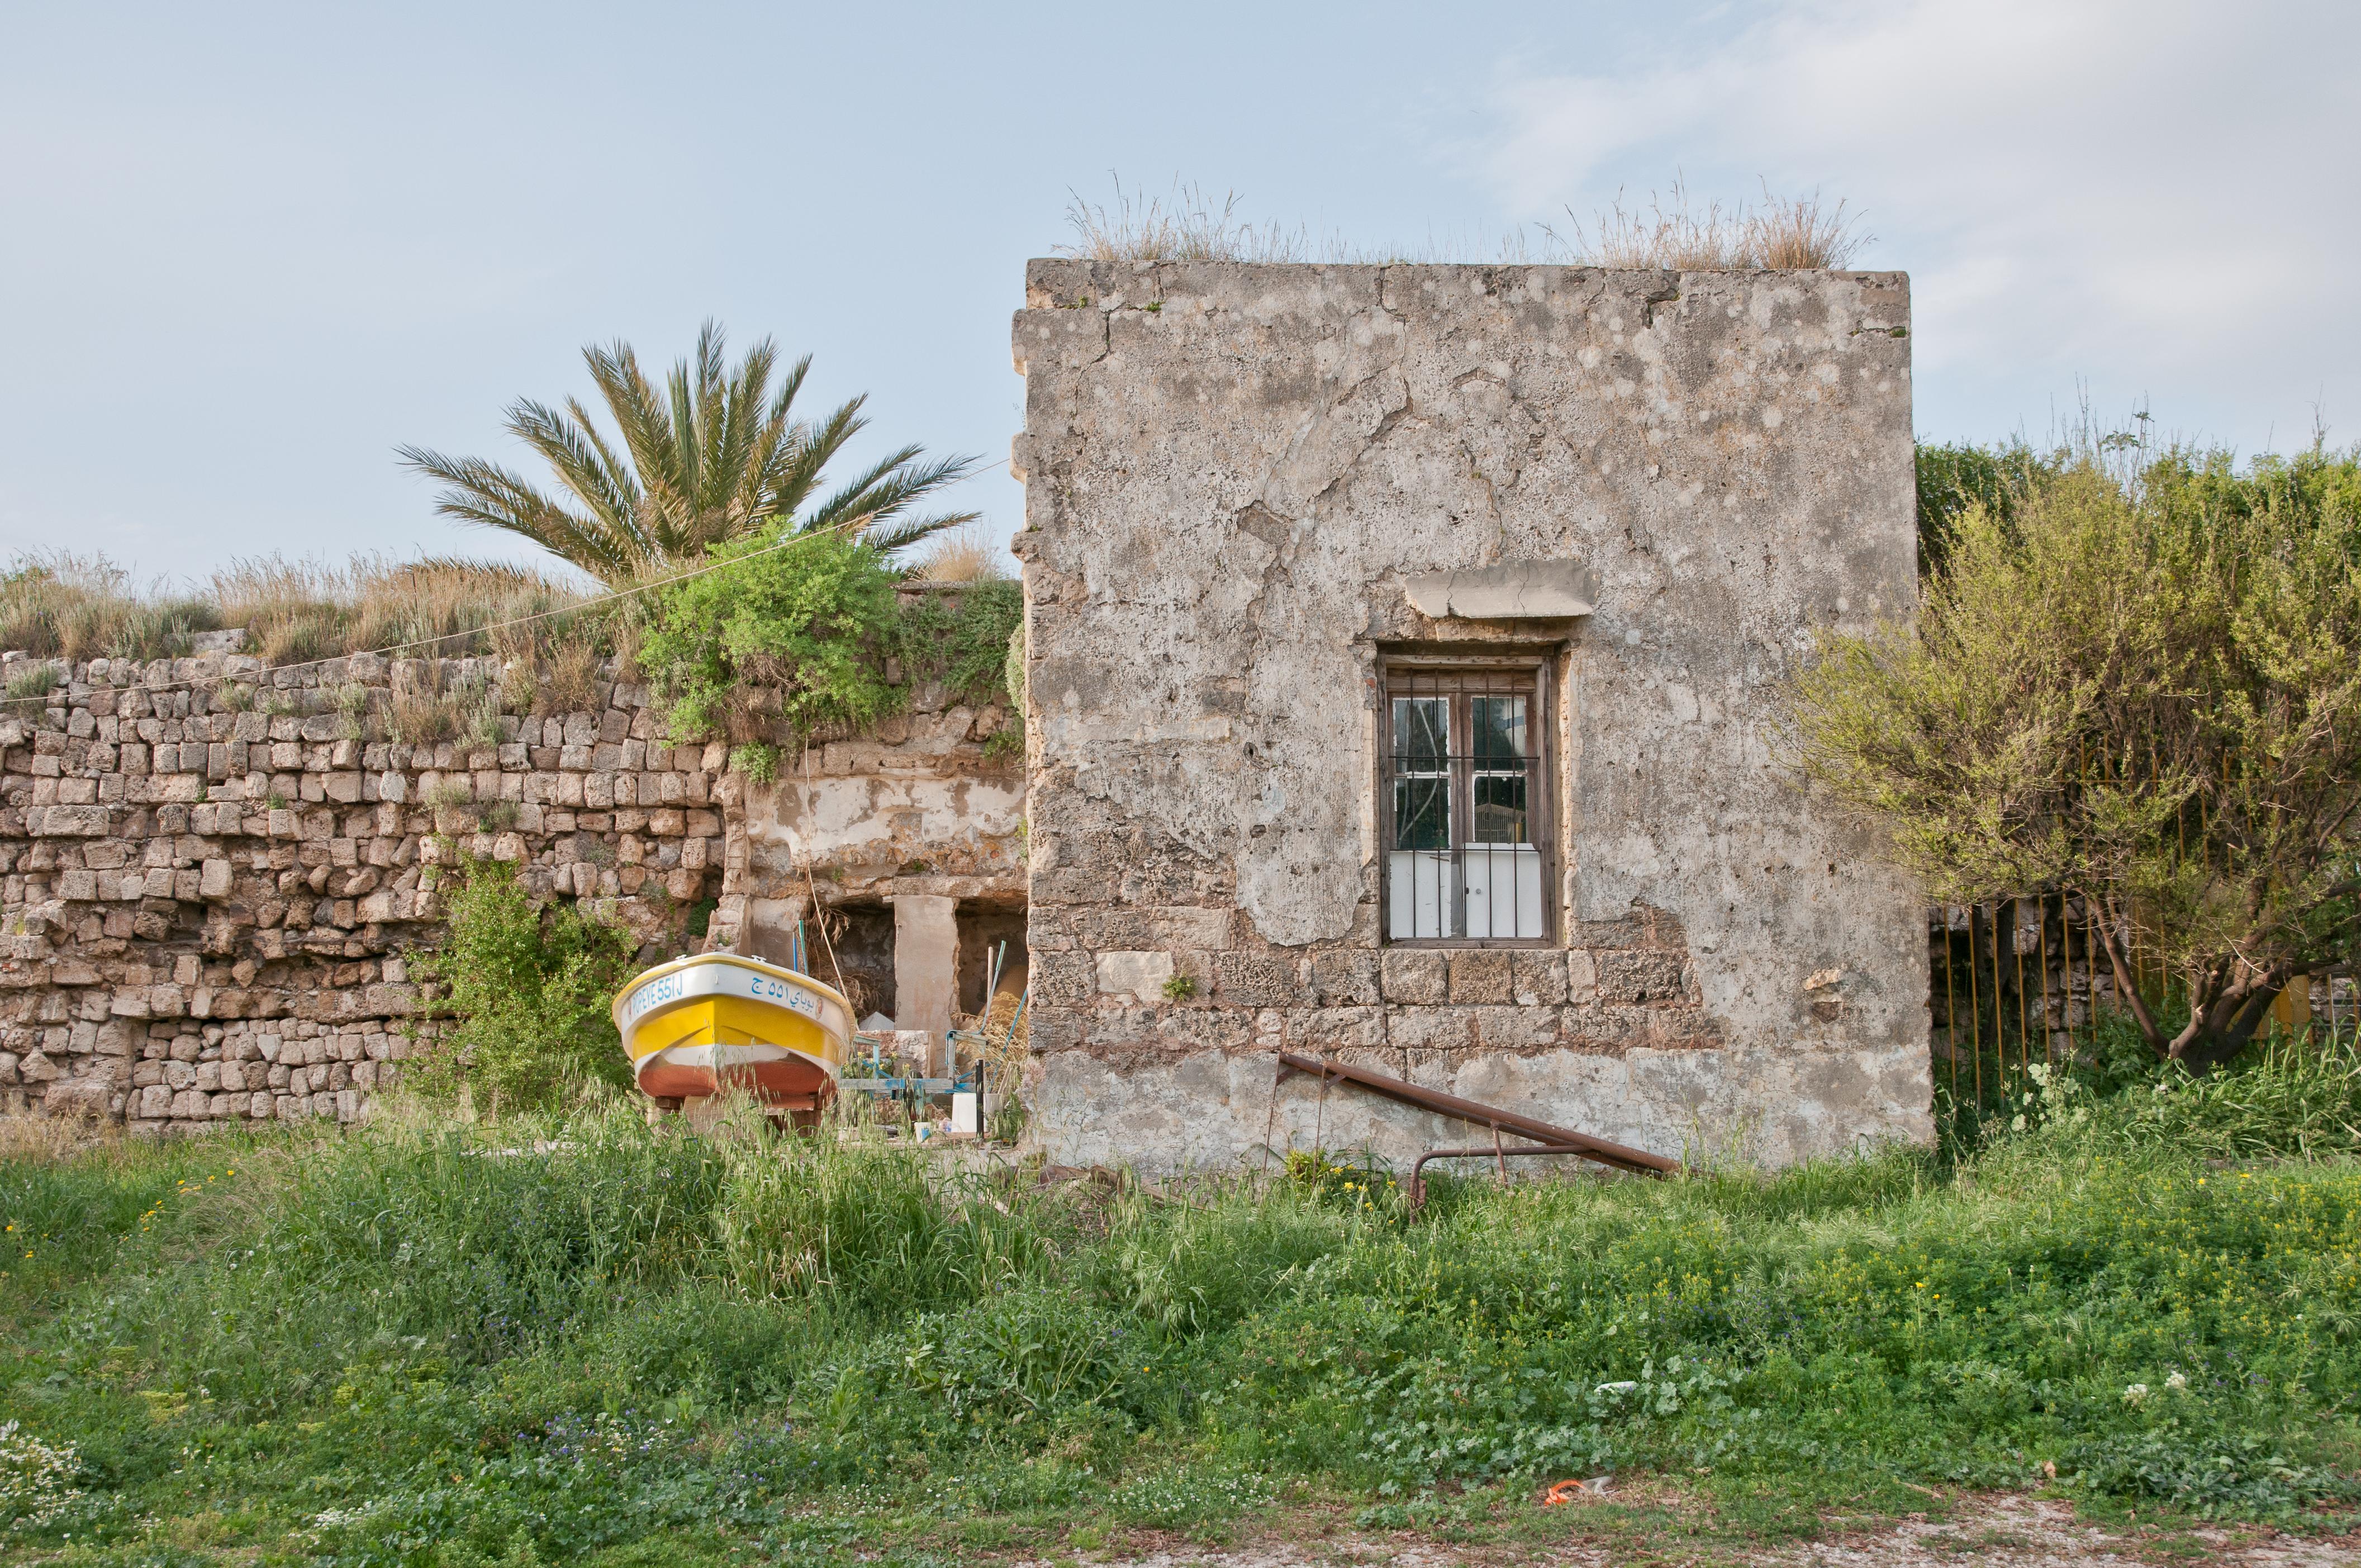 Paesaggio libico